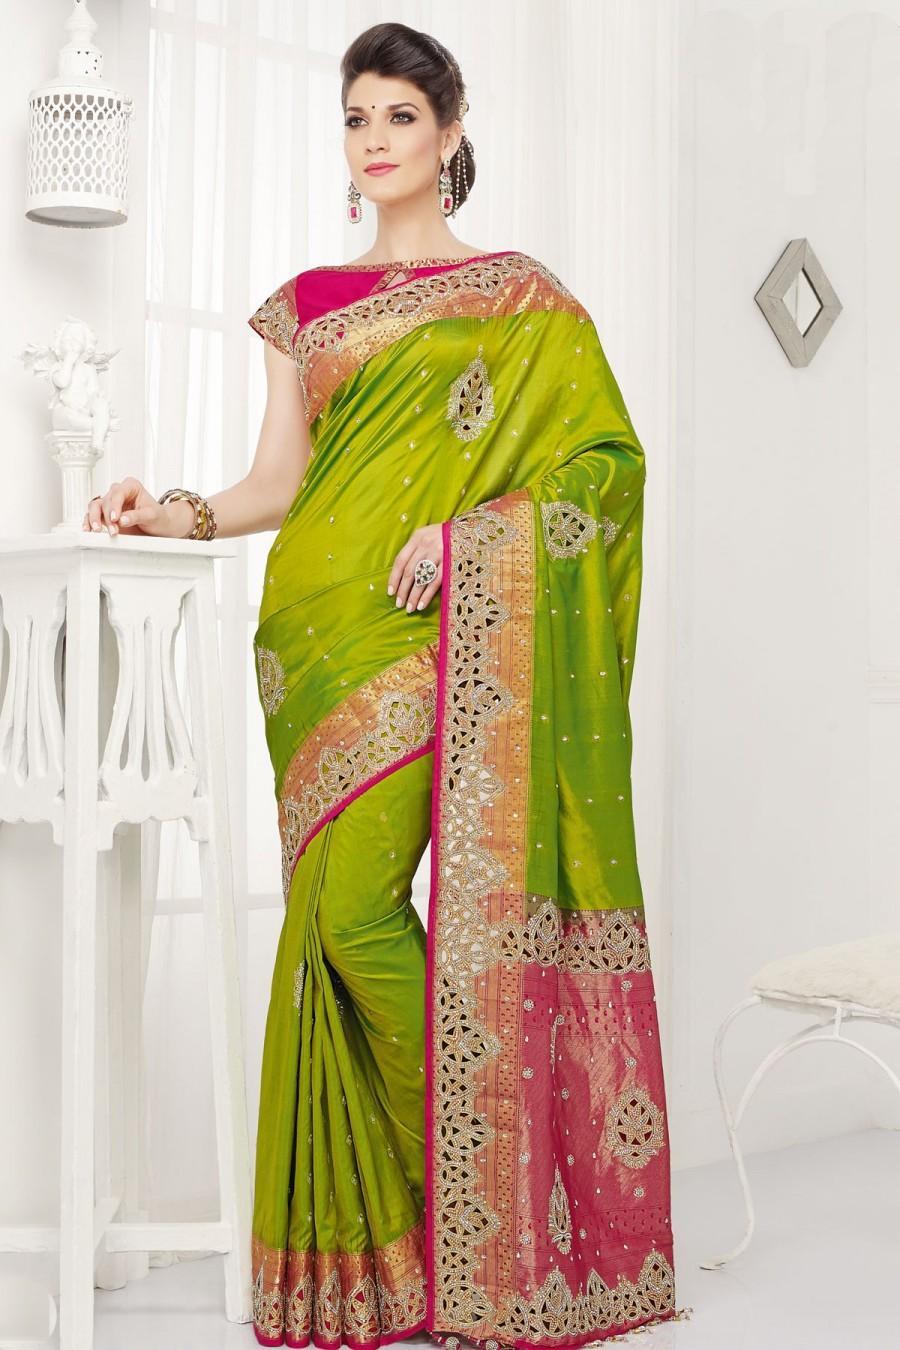 dde87a230c38 Green Pure Silk Grand Zari Weaved Saree With Gold Border #2459178 ...